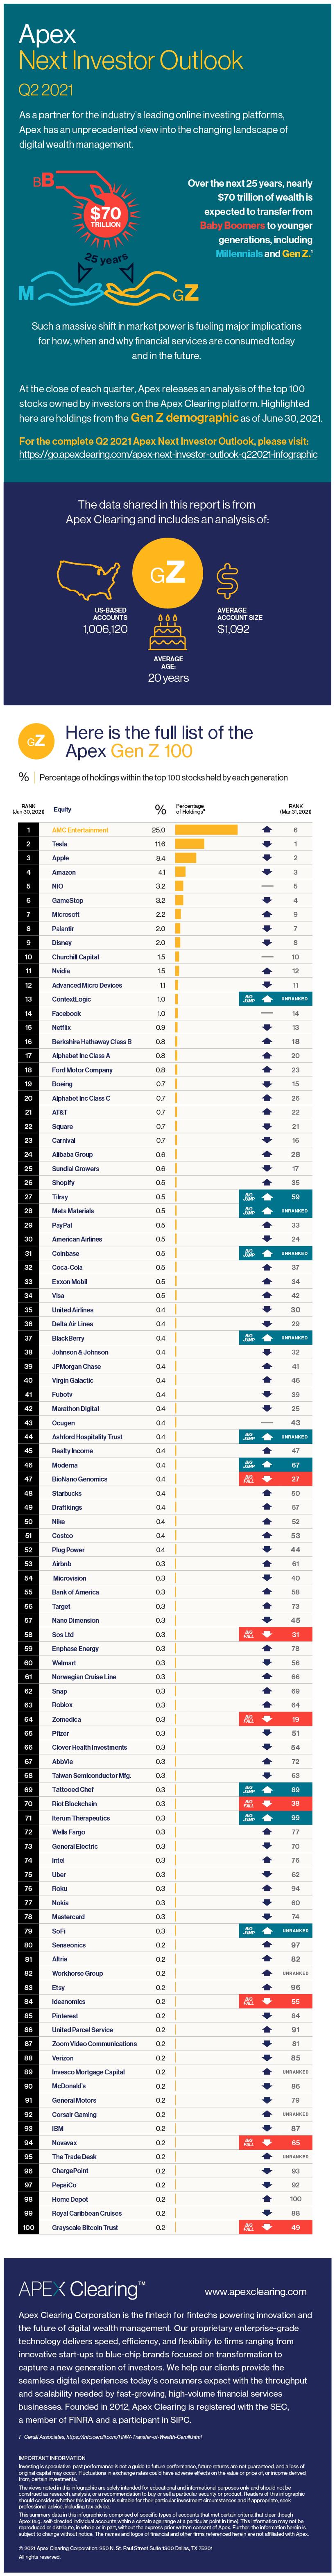 Apex Next Investor Outlook Top 100 Stocks